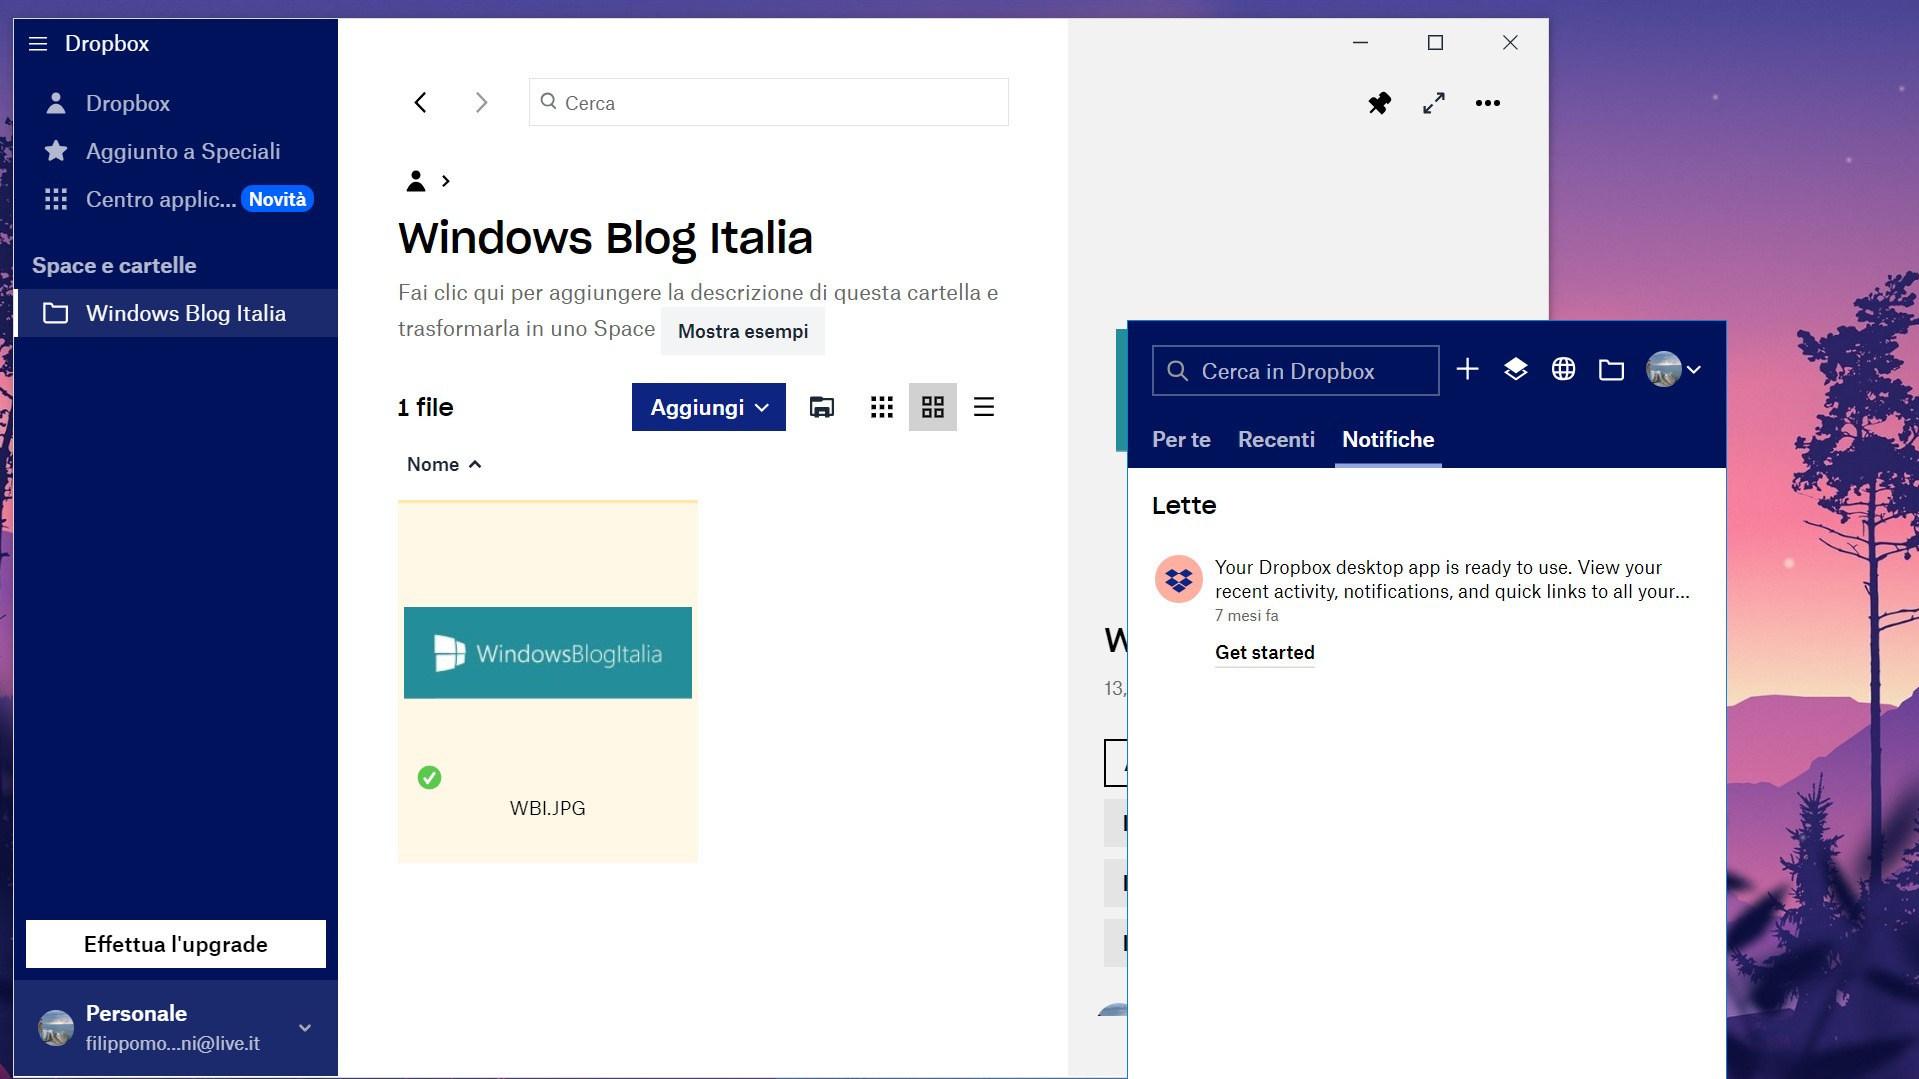 Dropbox für Windows 10